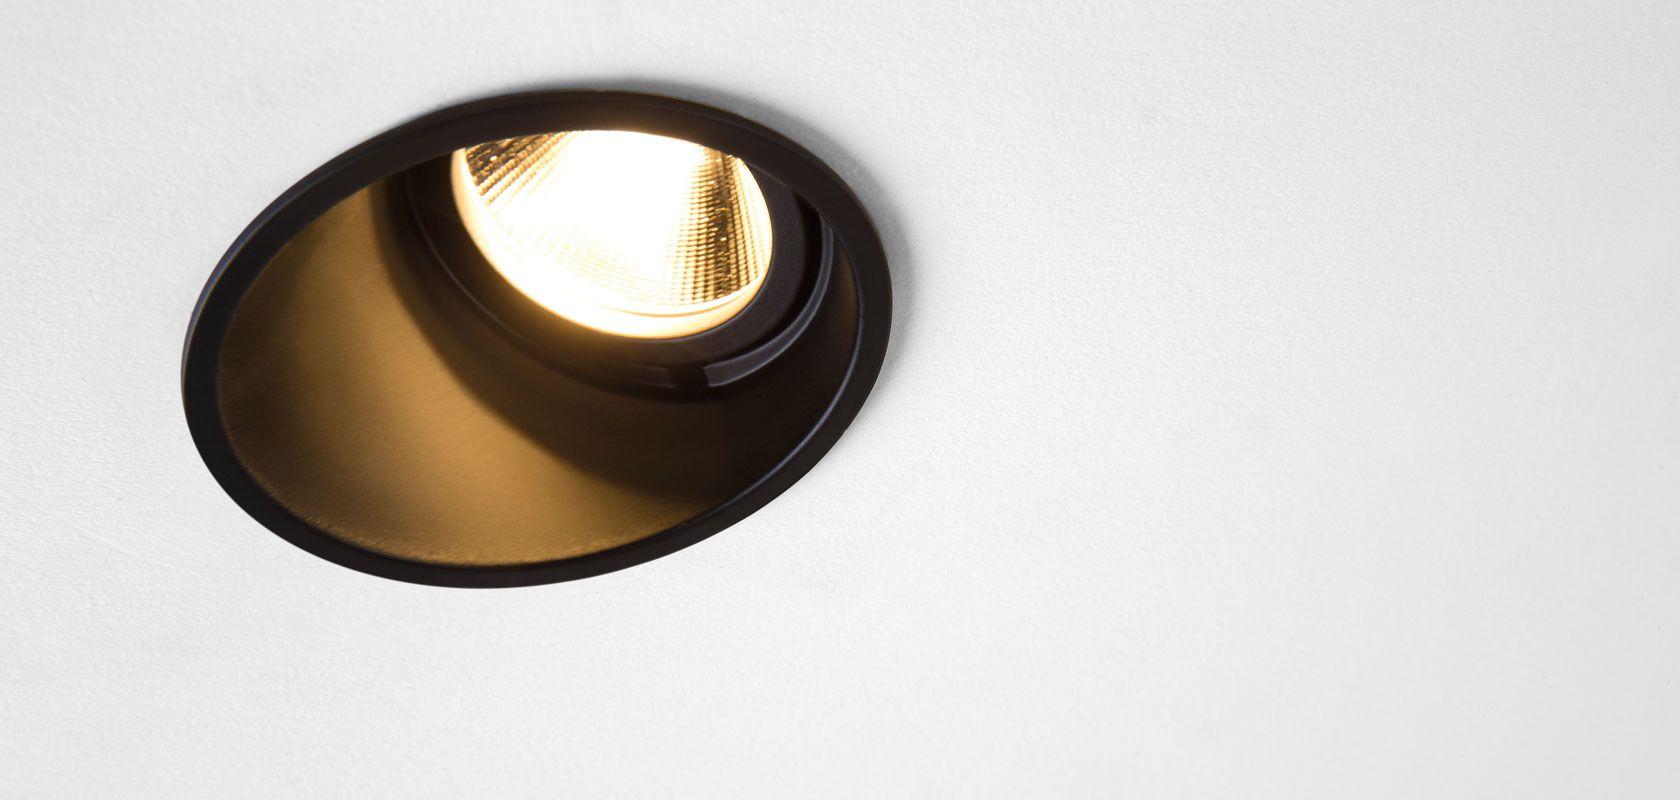 Asy Lotis - Modular lighting | Verlichting | Pinterest